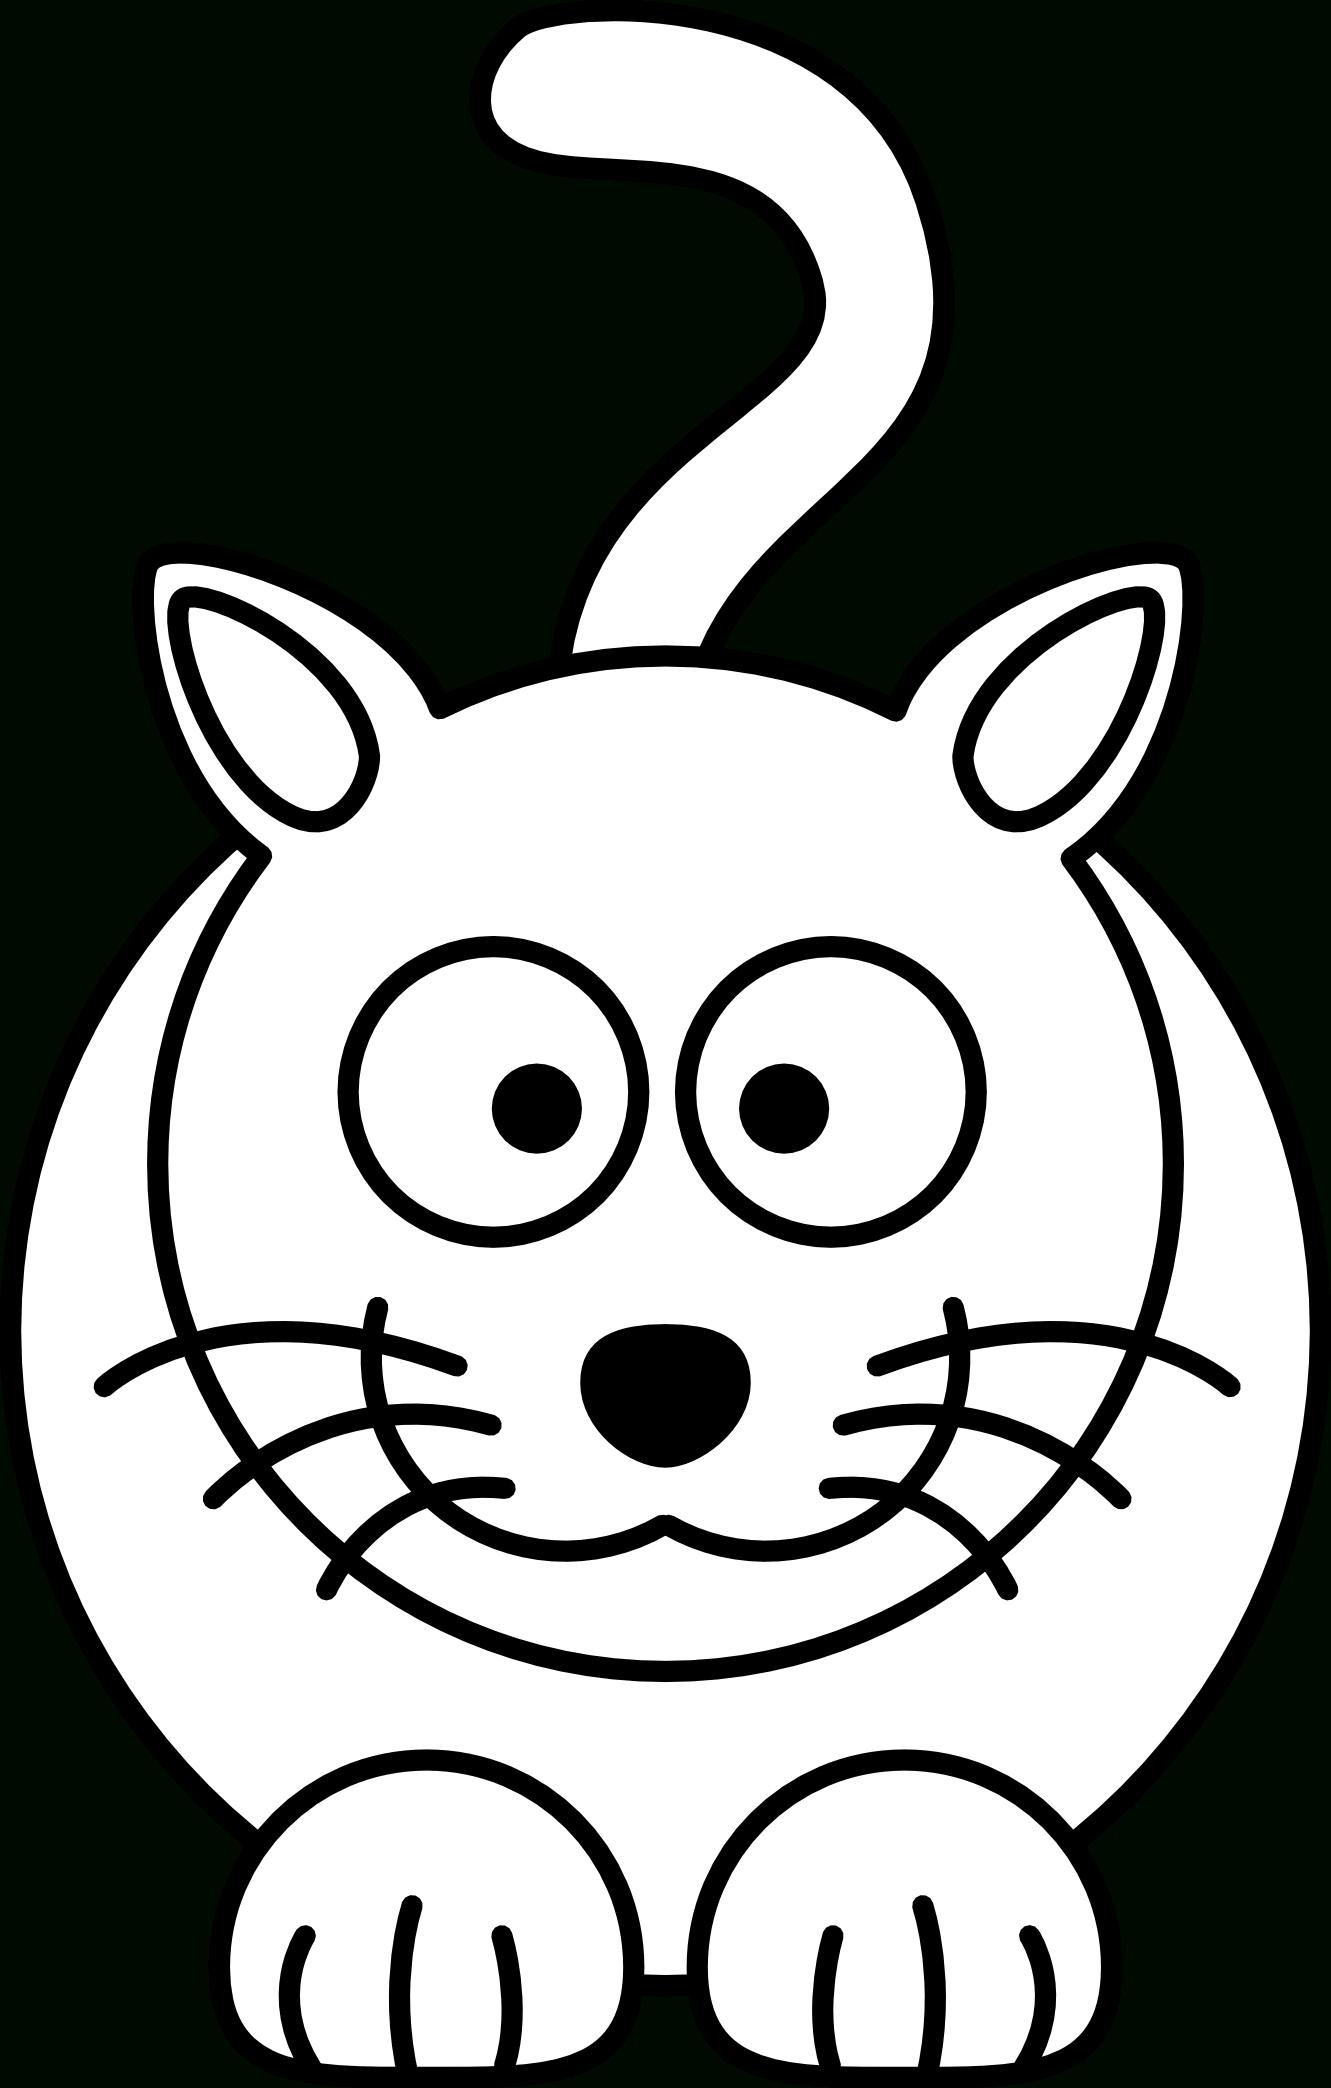 1331x2088 Cat Cartoon Drawing How To Draw A Cartoon Cat